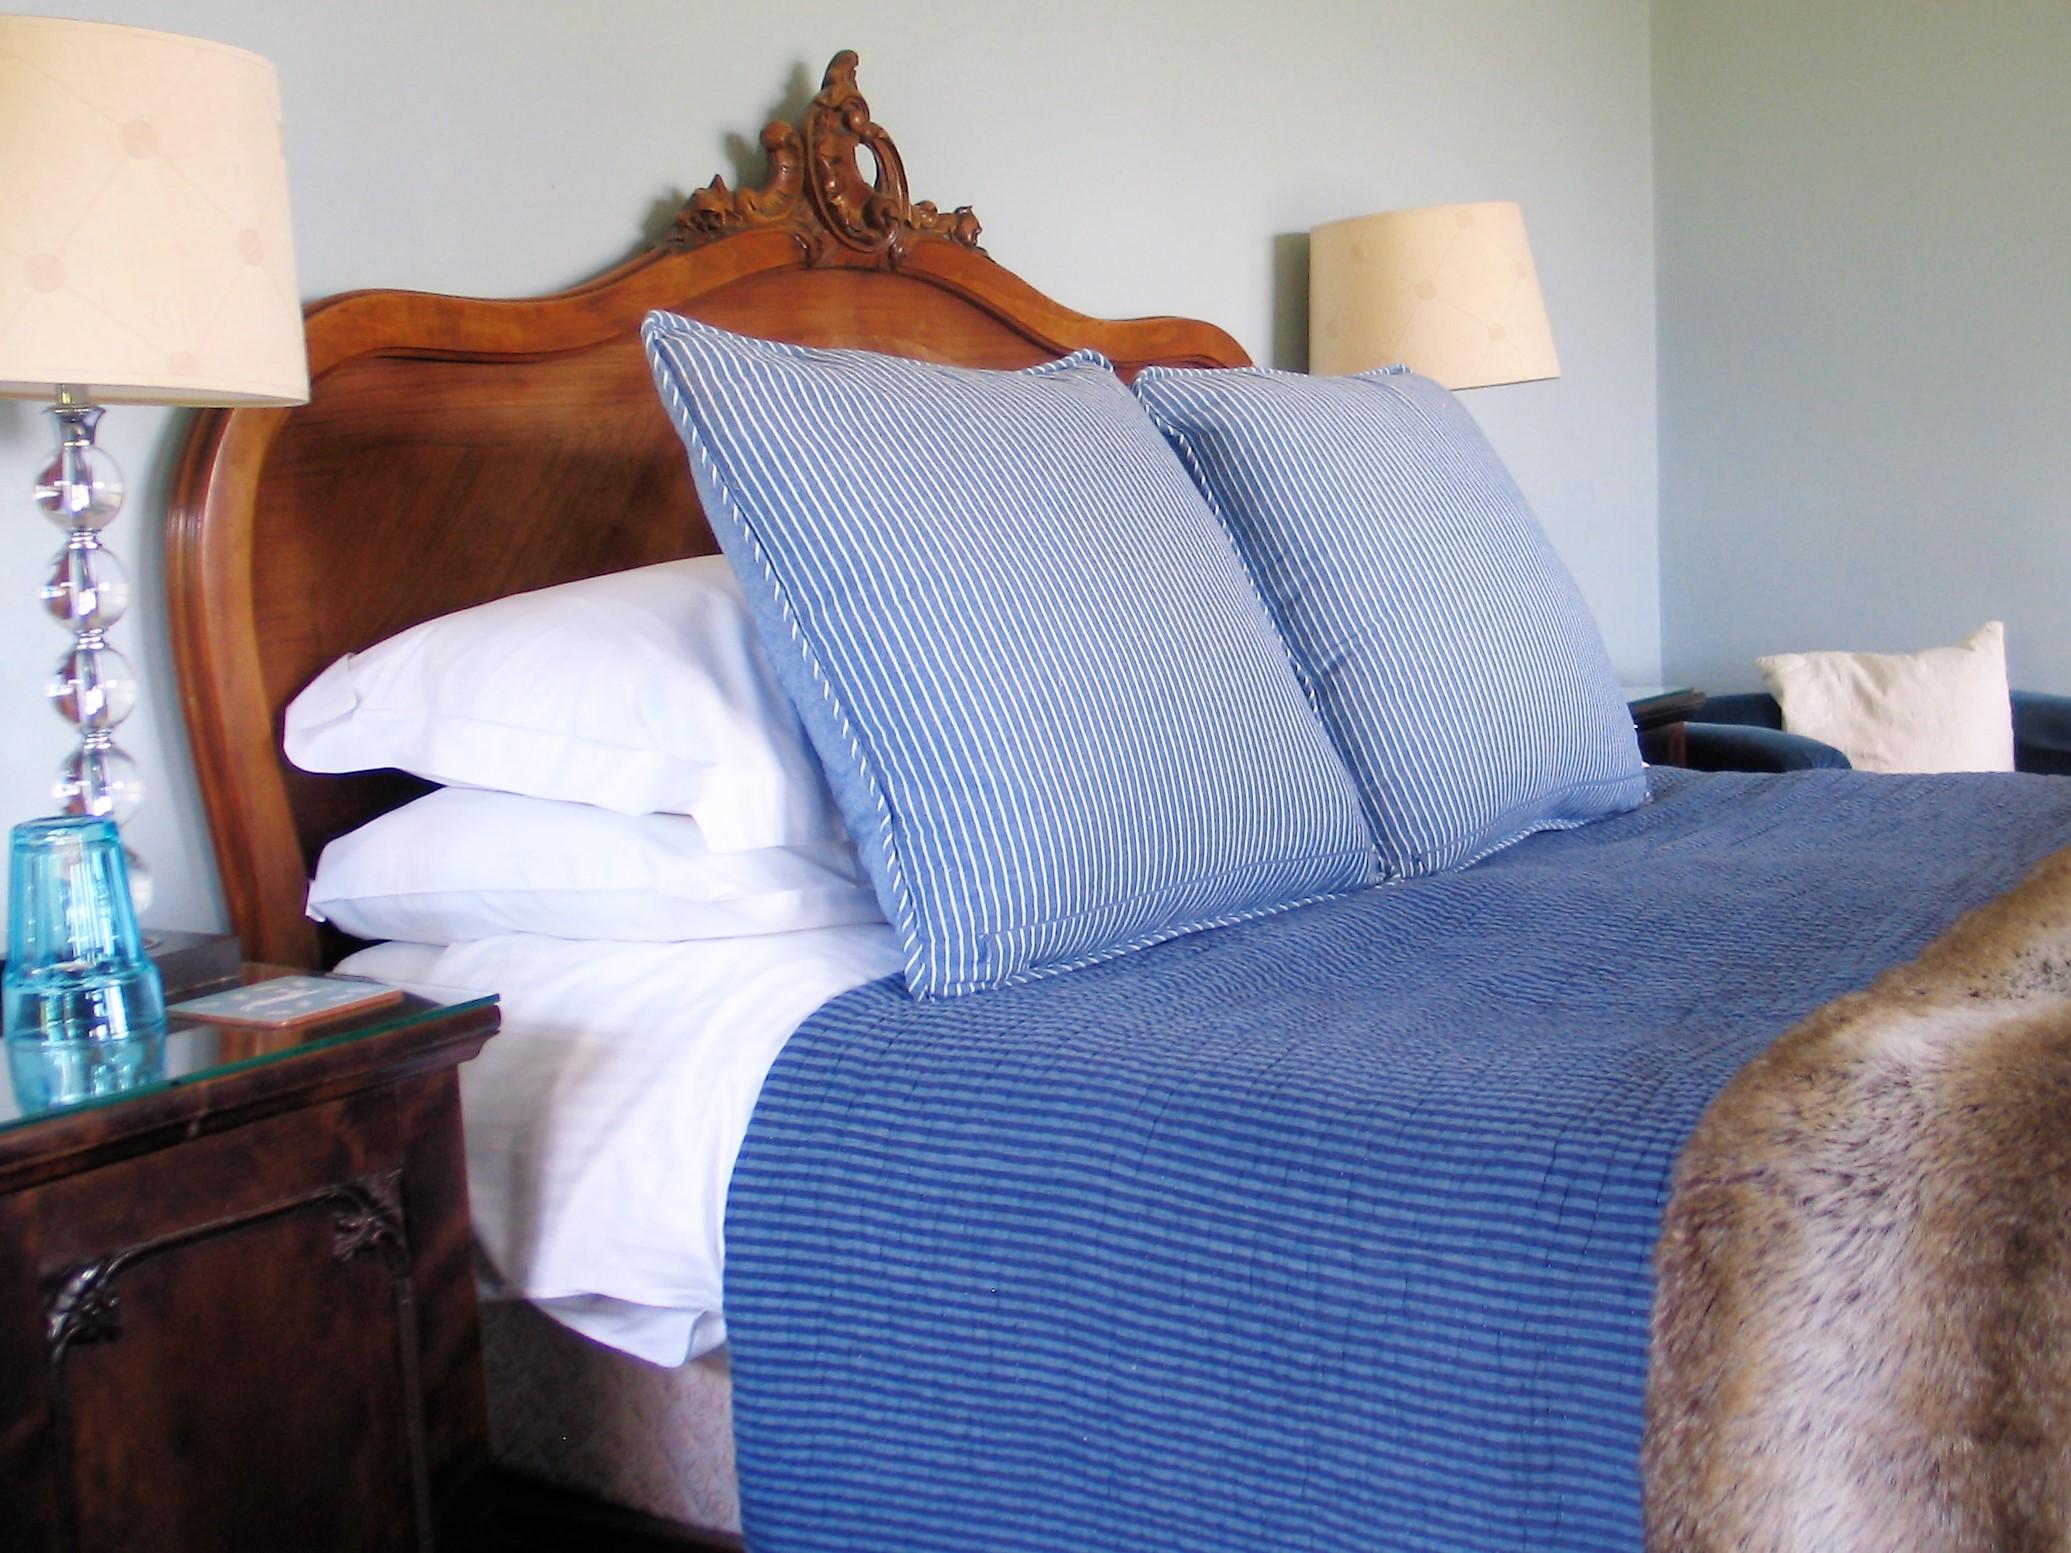 blue-freench-bed.JPG